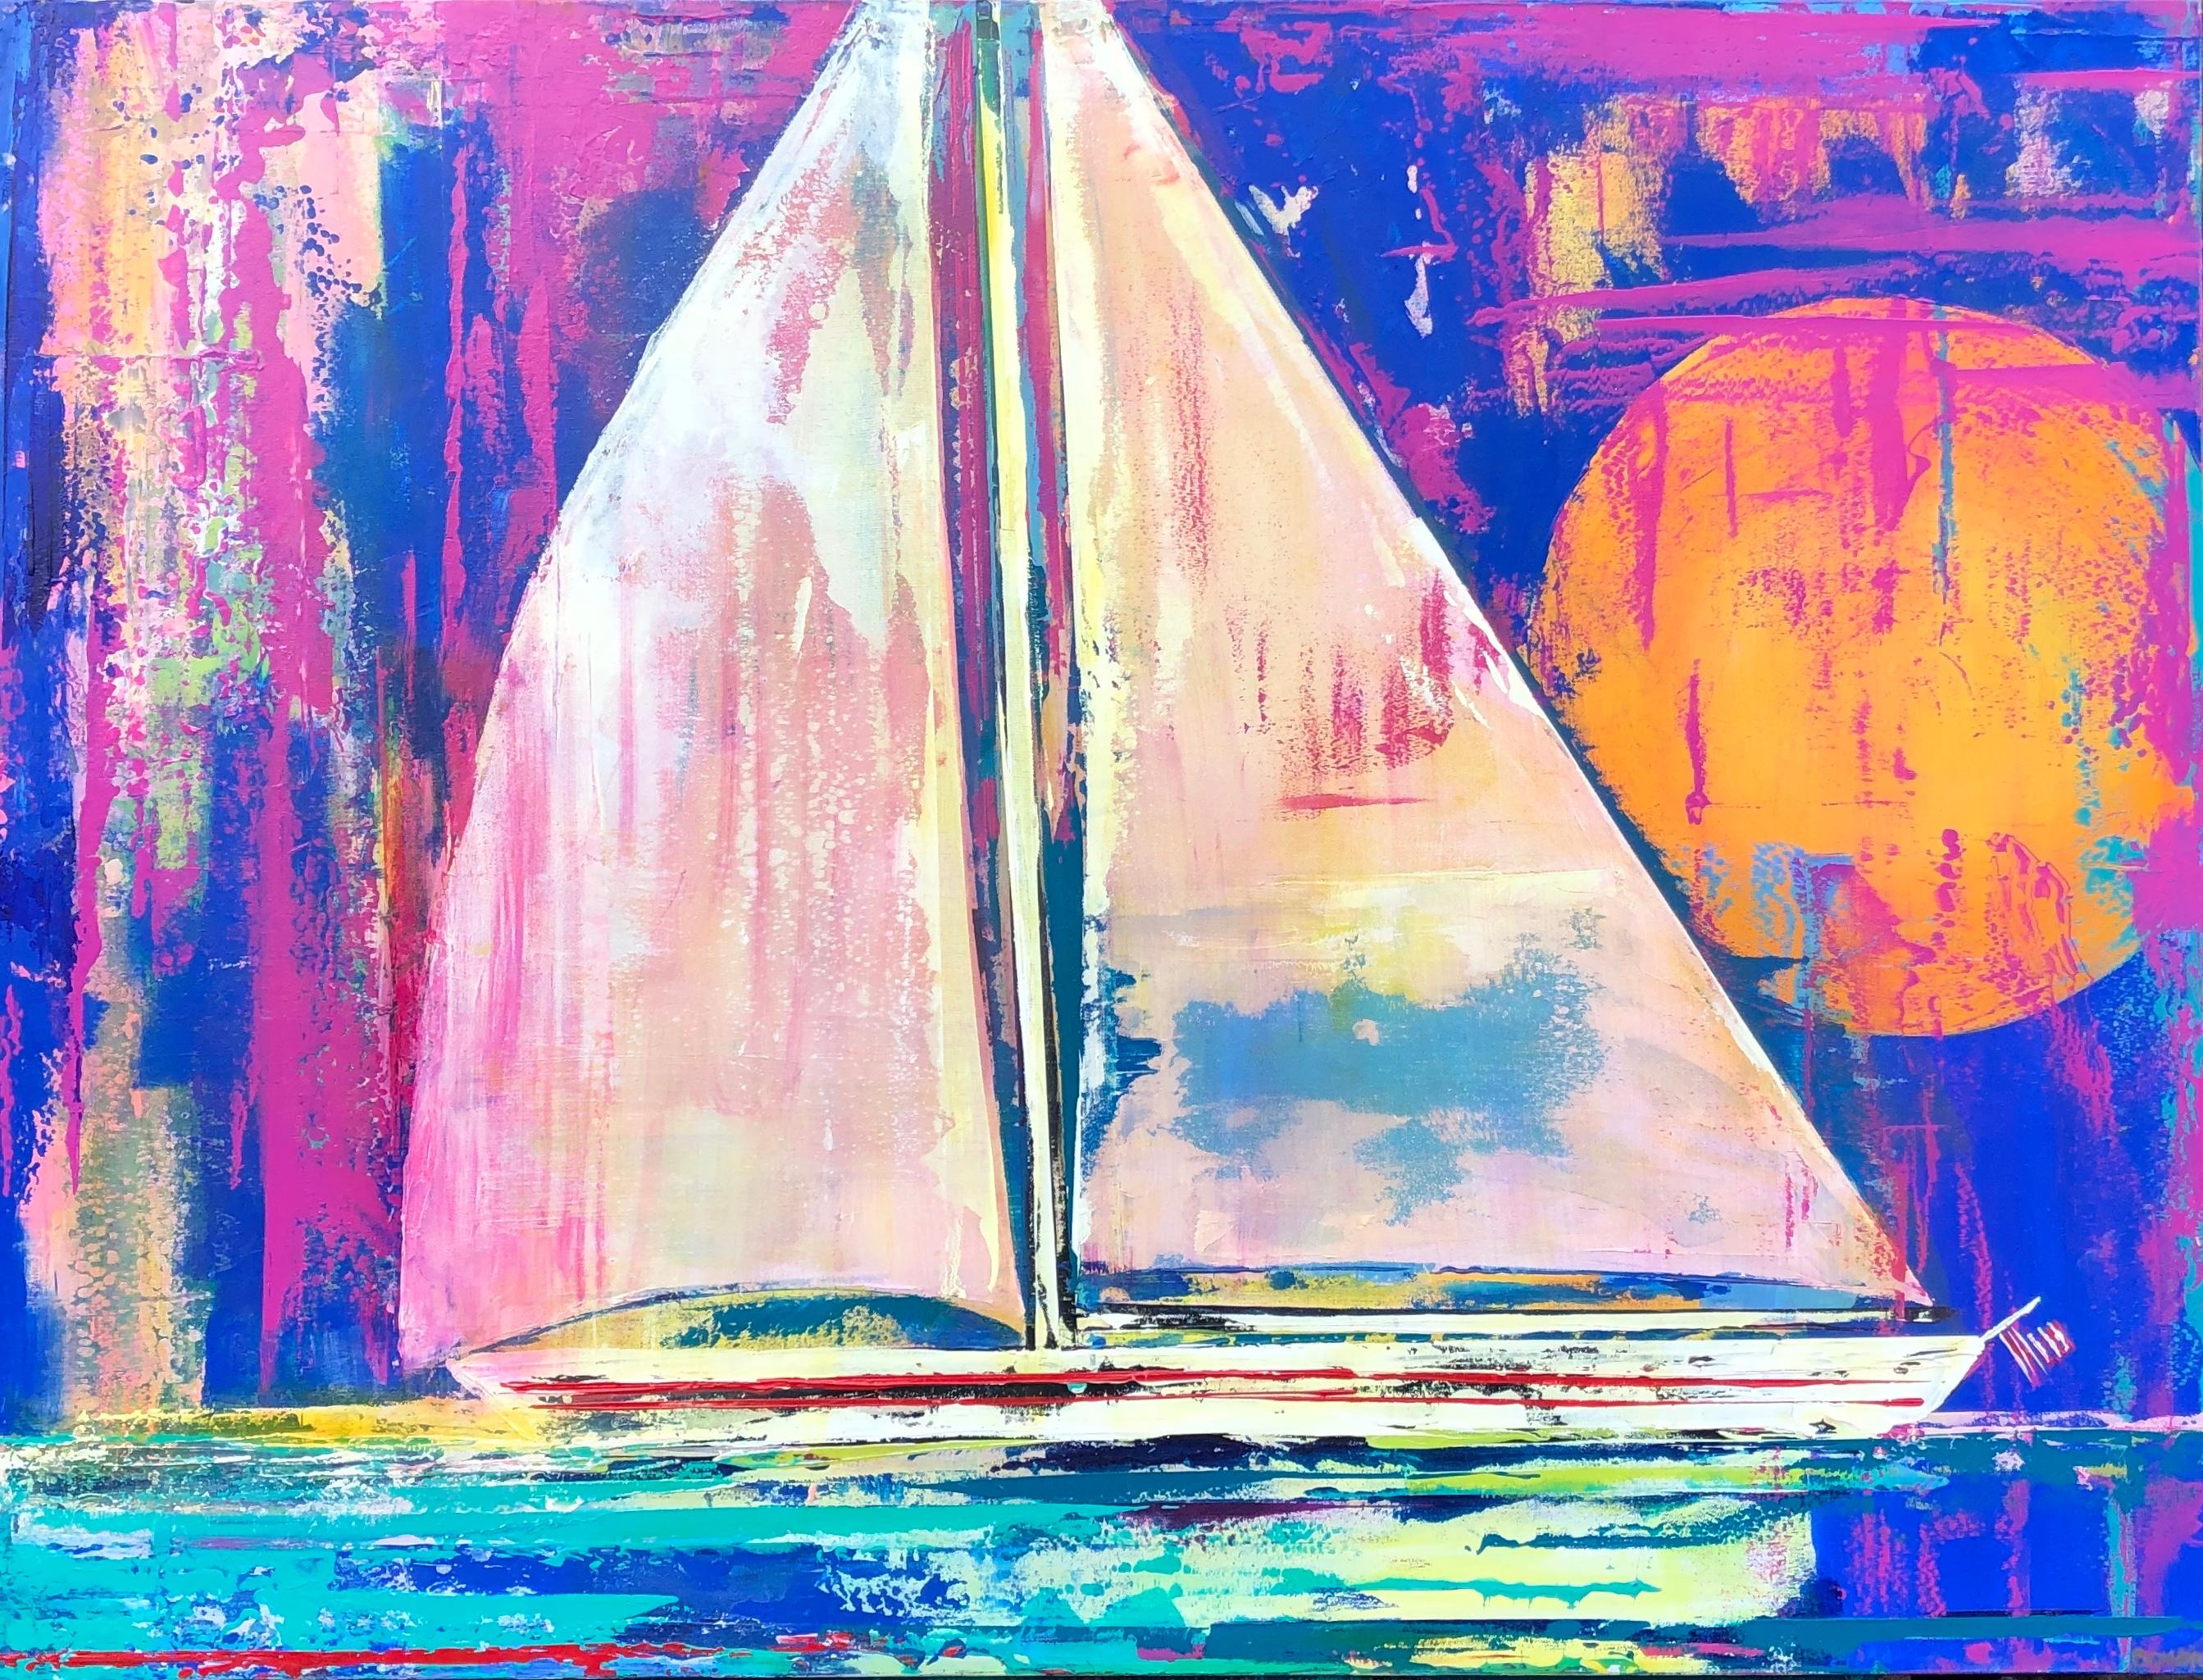 Setting sail el5uyw